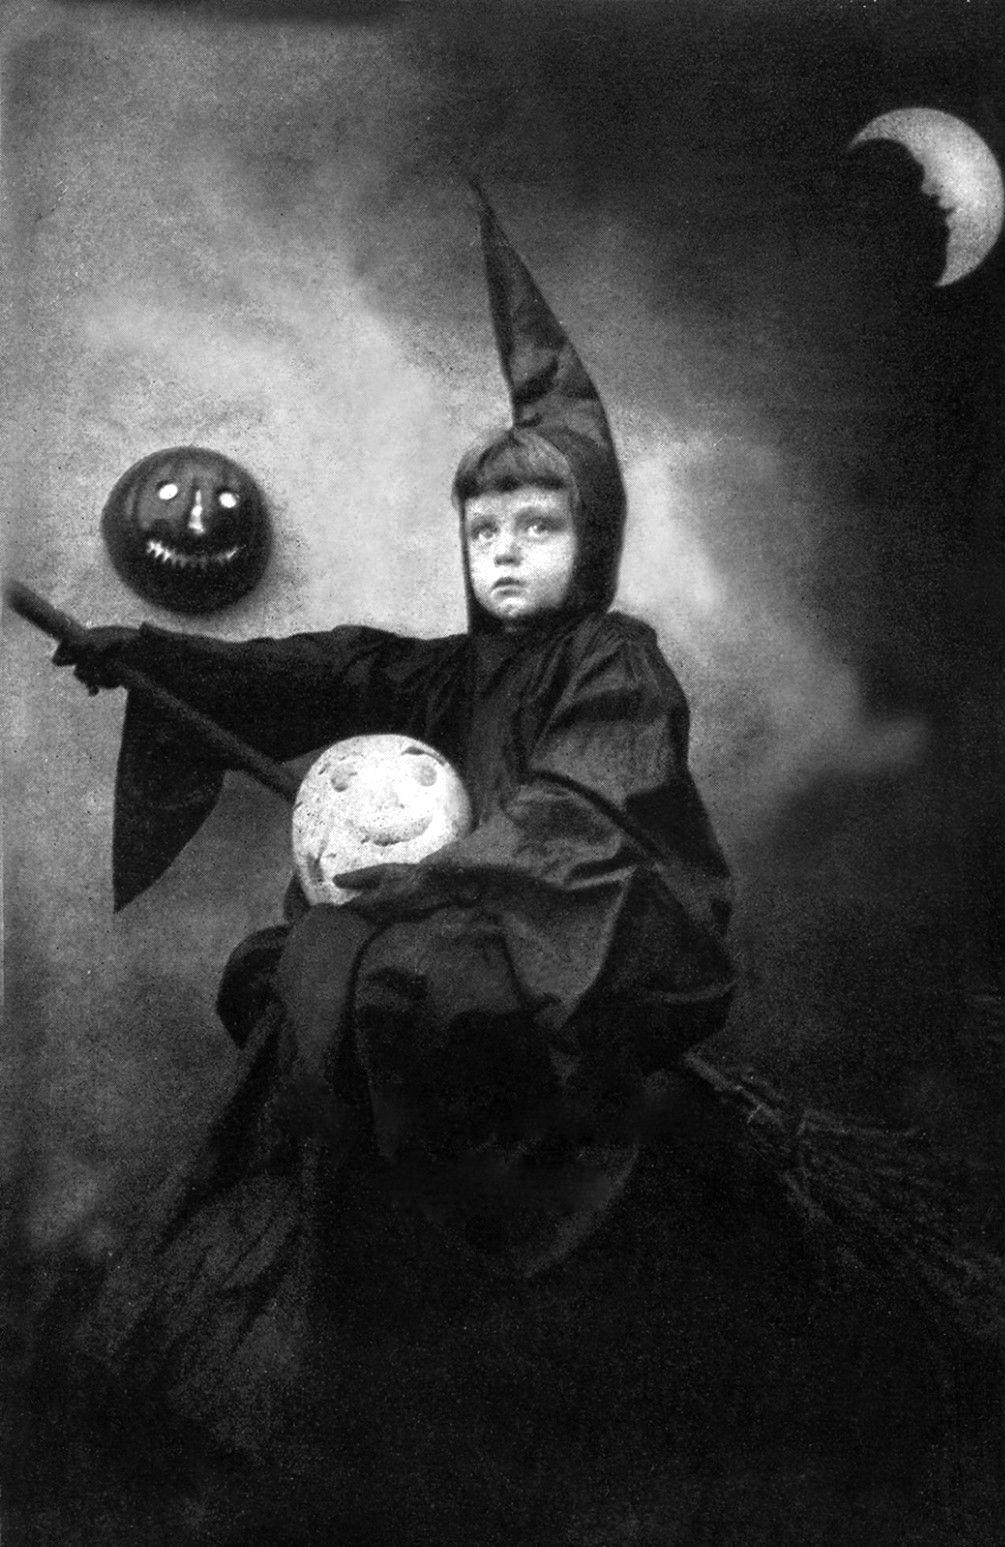 Spooky Portrait Of Child .1922 Halloween Favorite